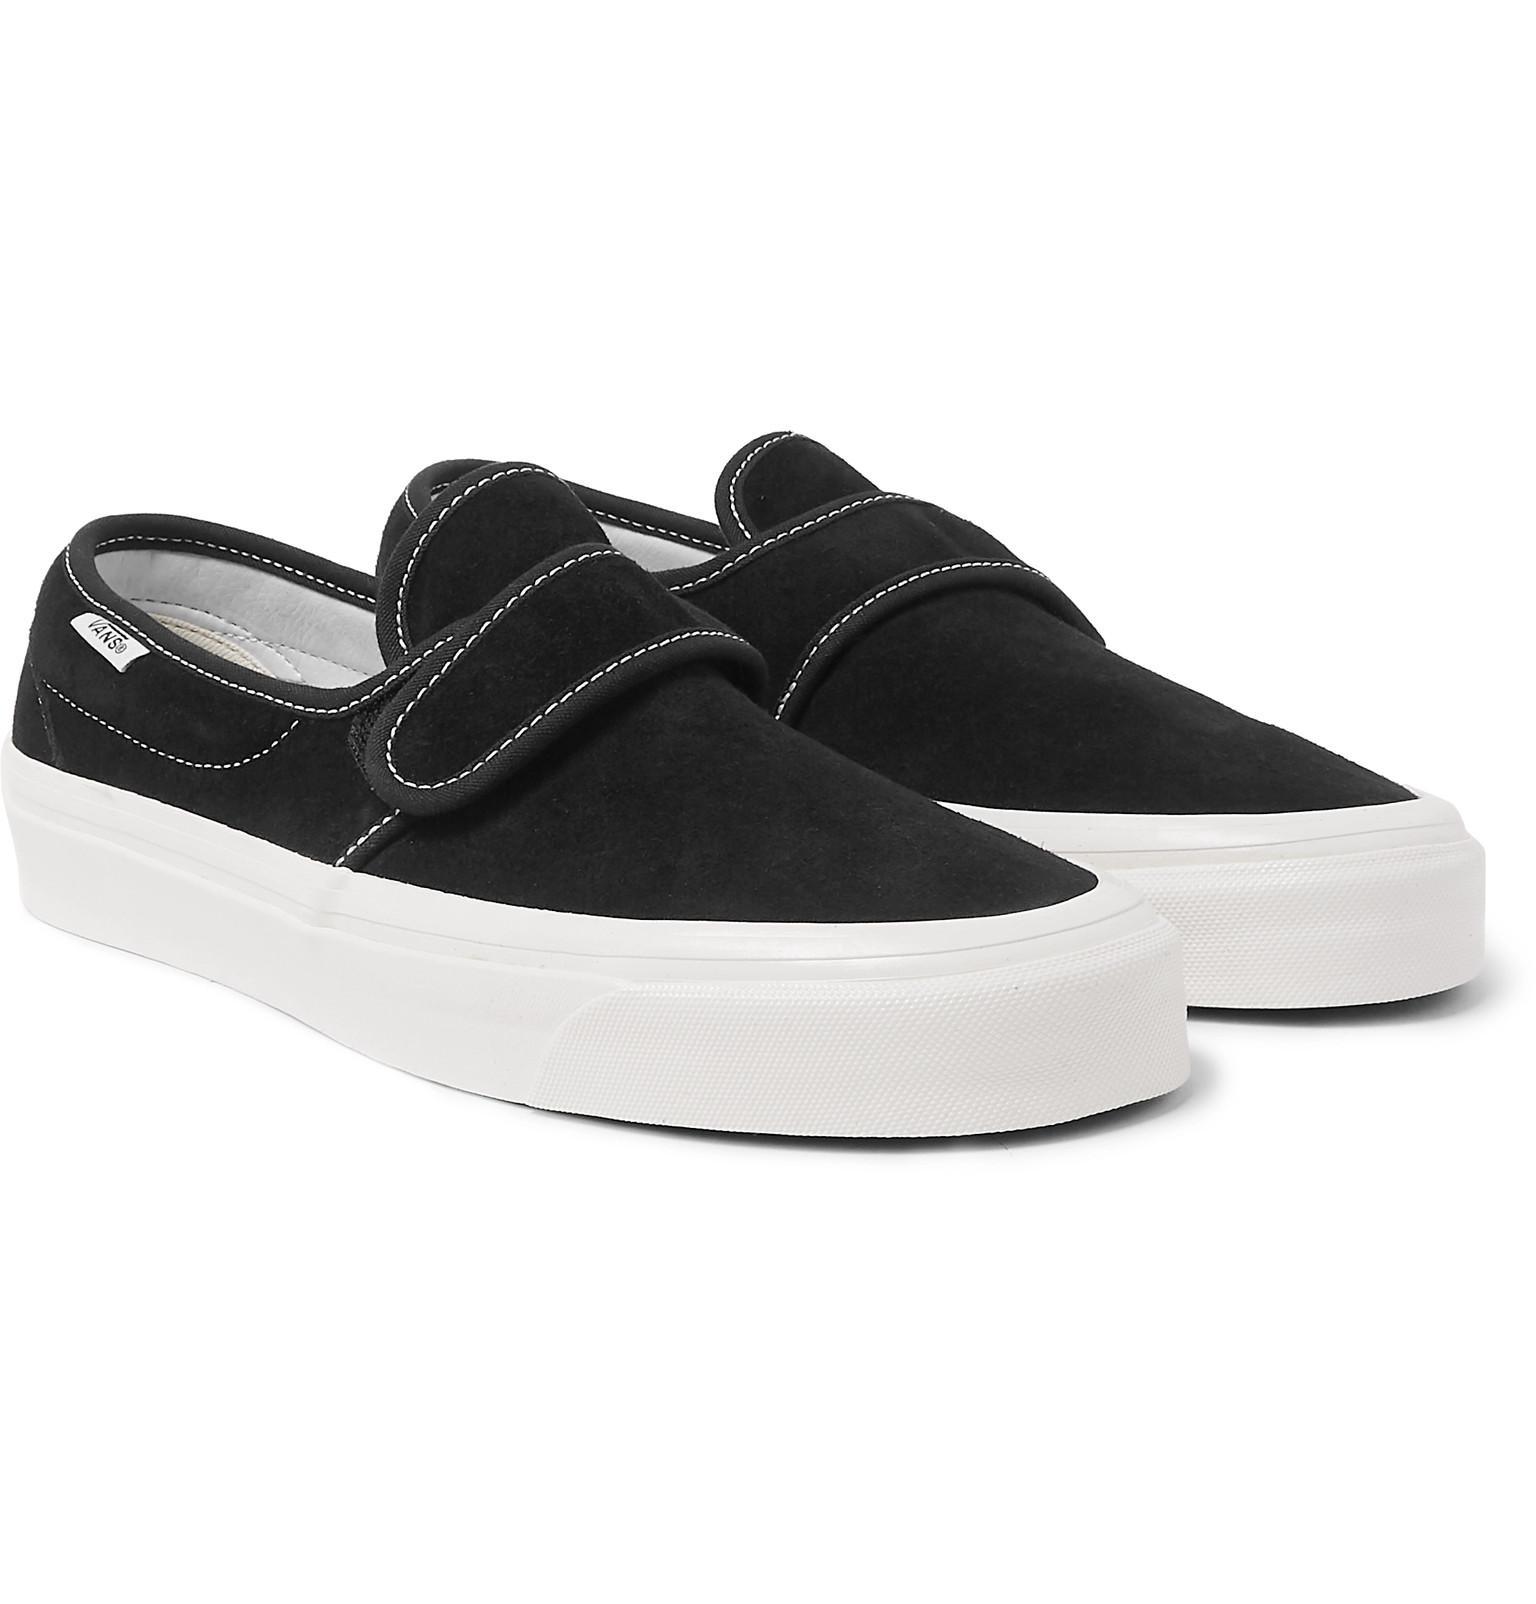 509f2818c95 Lyst - Vans Anaheim 47 V Dx Suede Sneakers in Black for Men